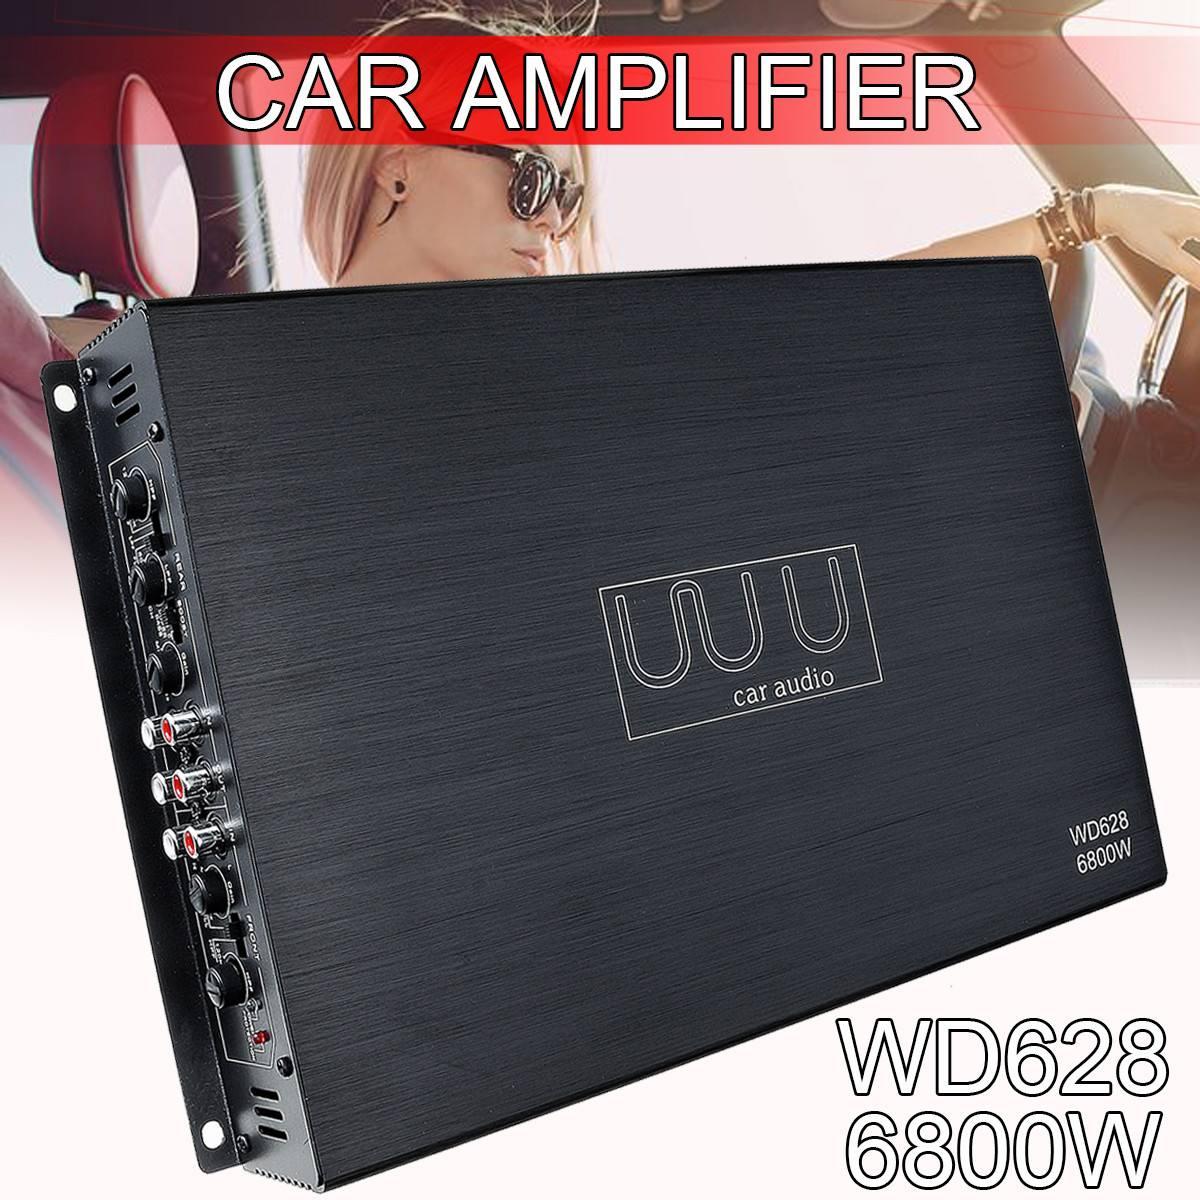 3800 Watt Car Audio Power Stereo Amplifier RMS 4 CH Channel Powerful PWM 4Ohm